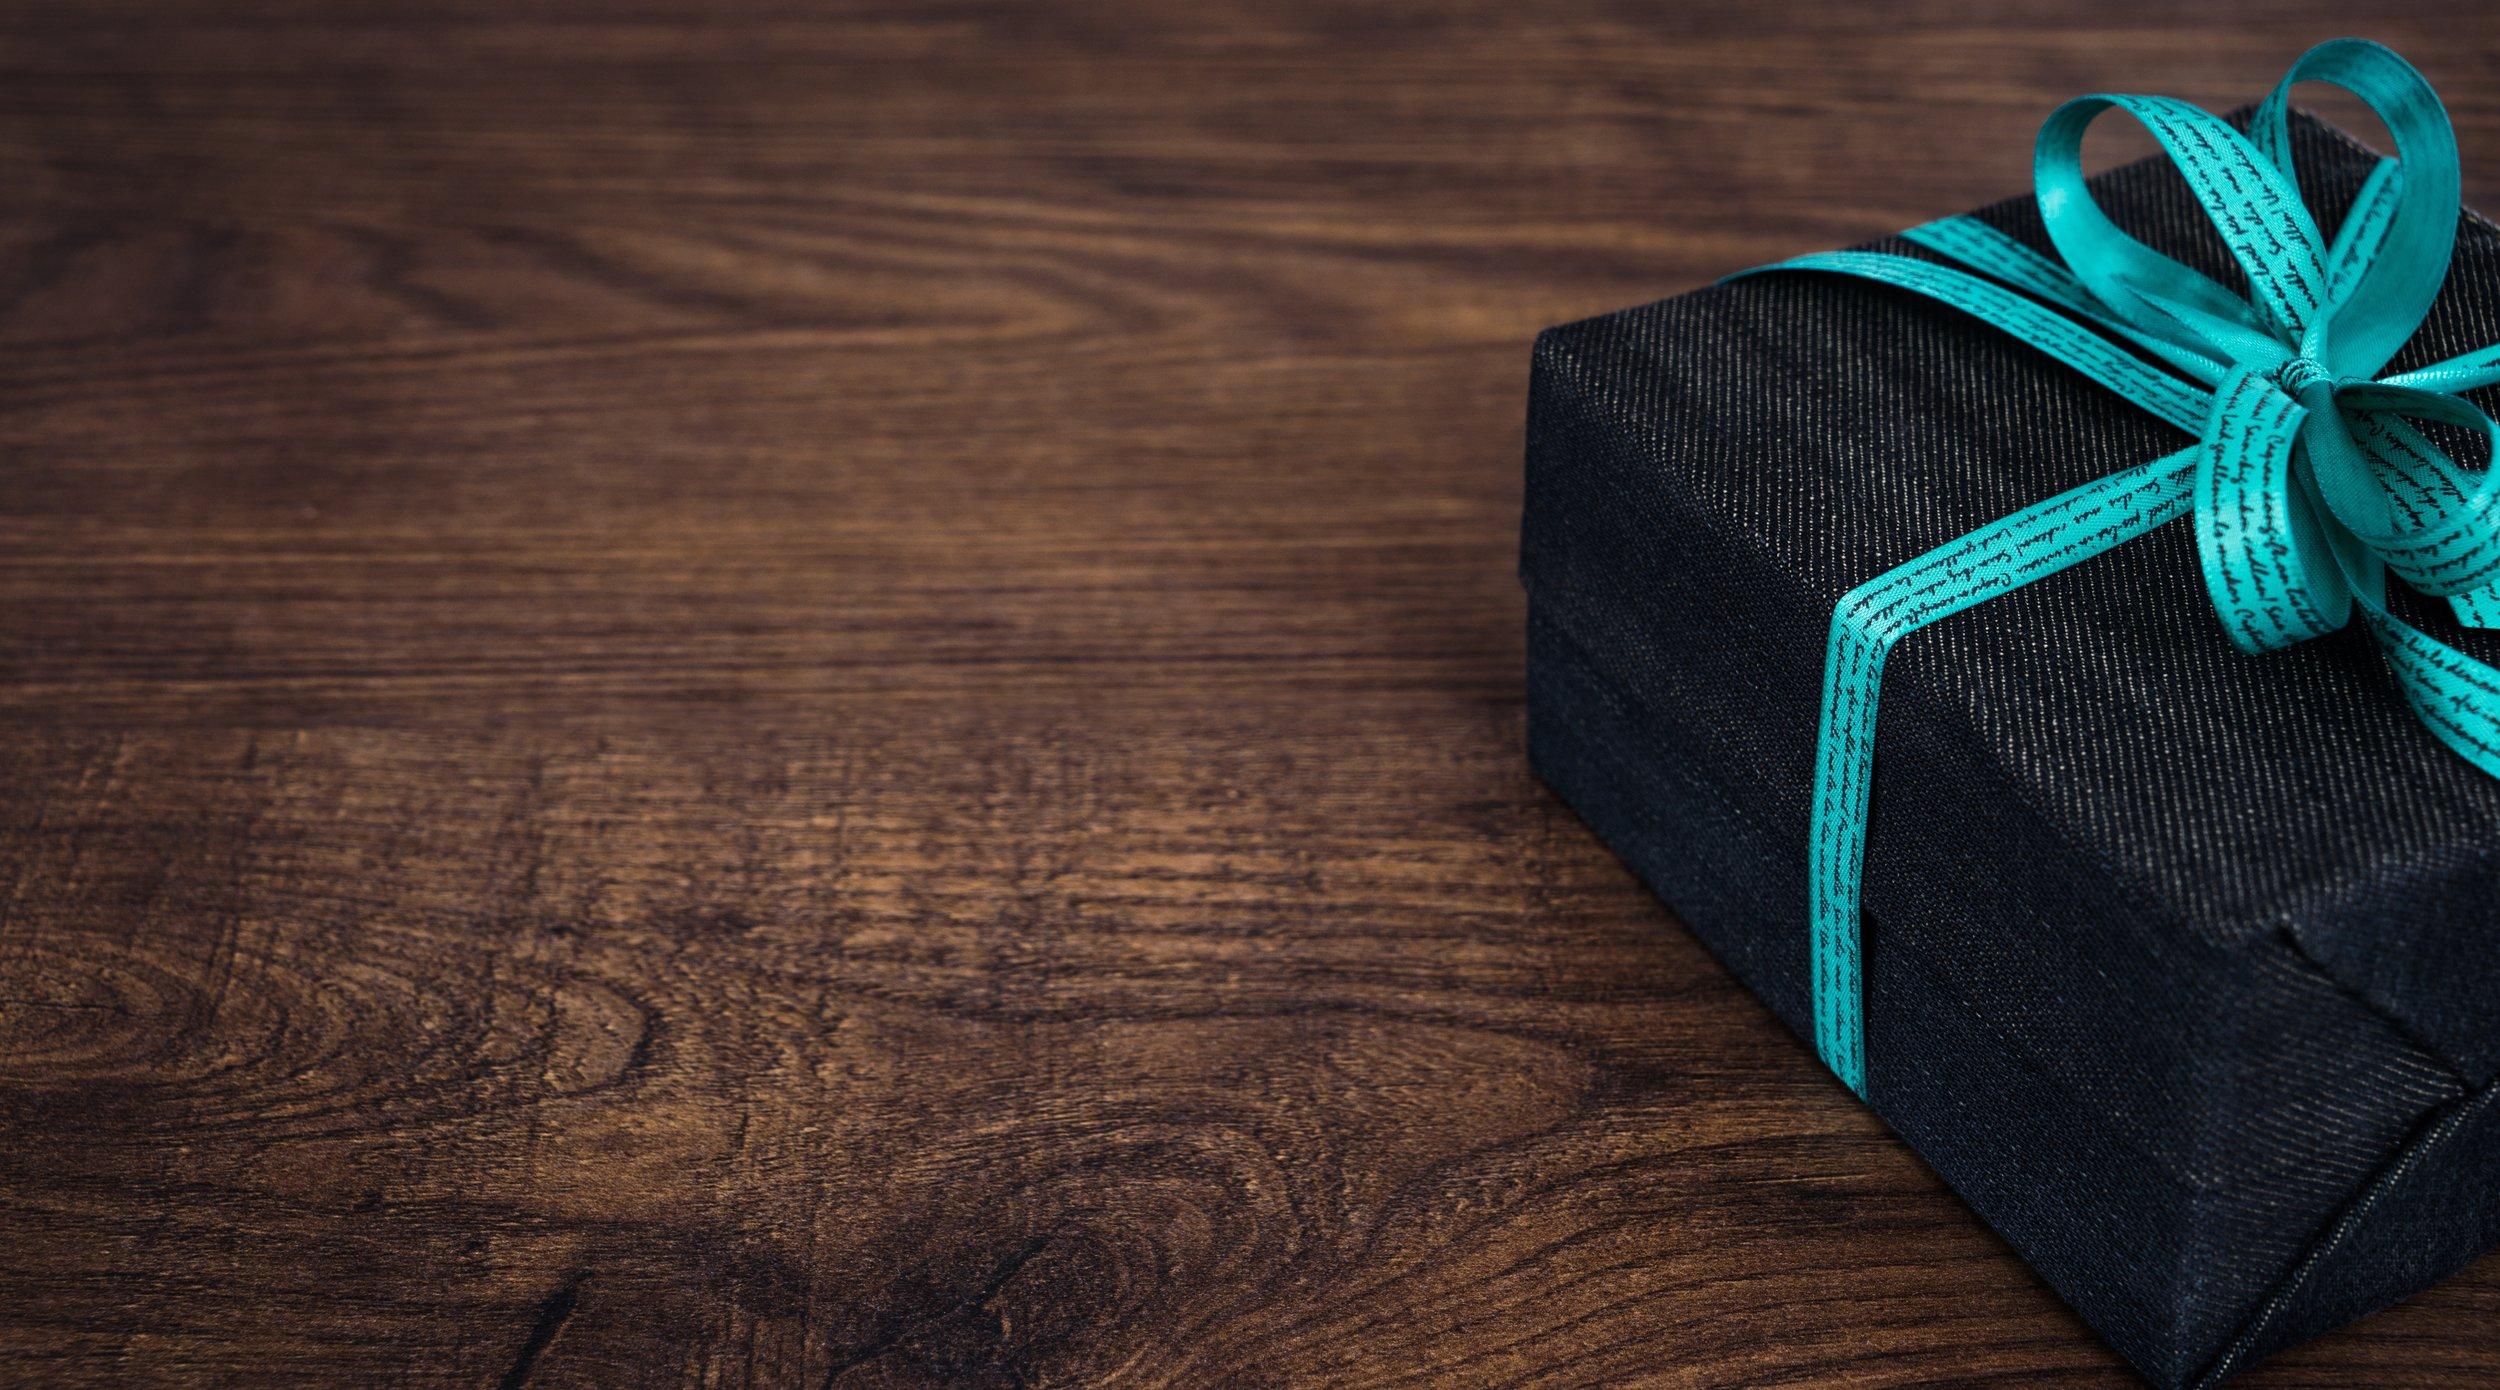 birthday-box-gift-157879.jpg